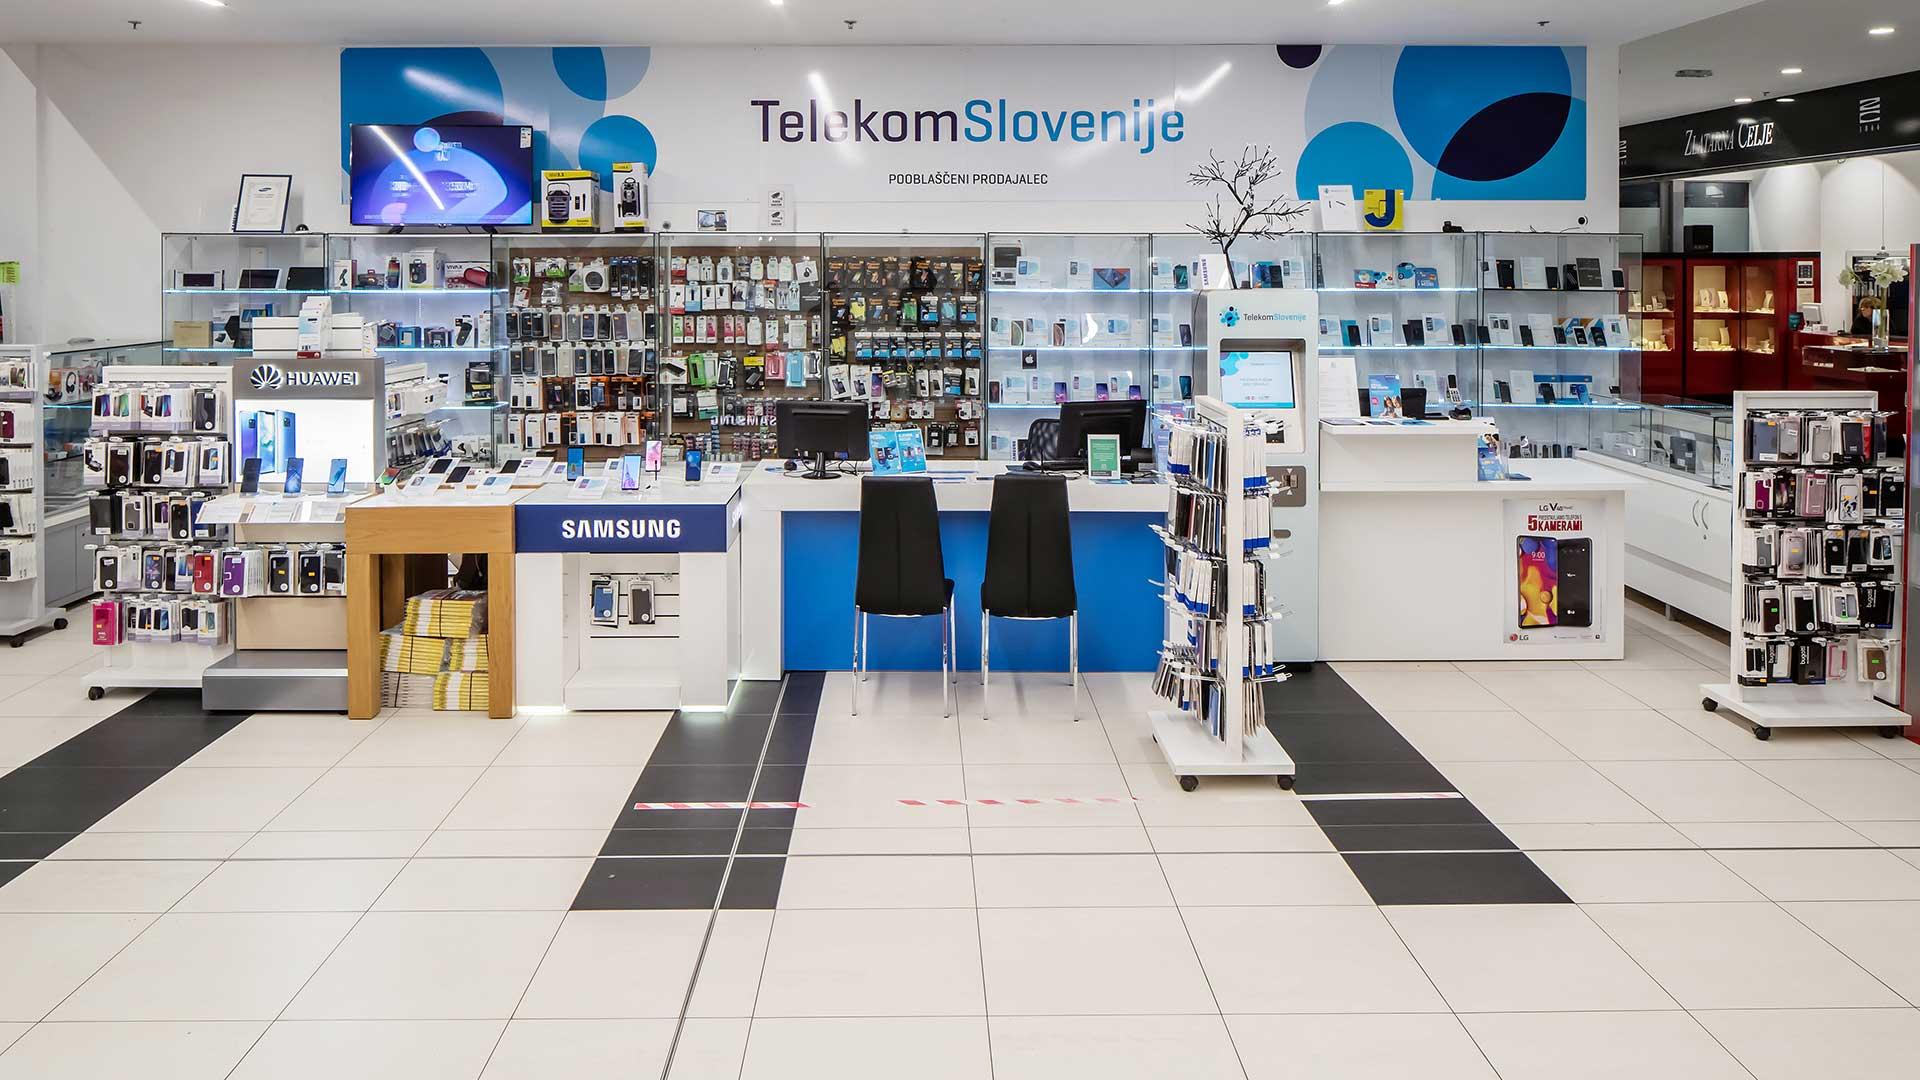 1013-hero-Pal-Media-Telekom-Slovenije